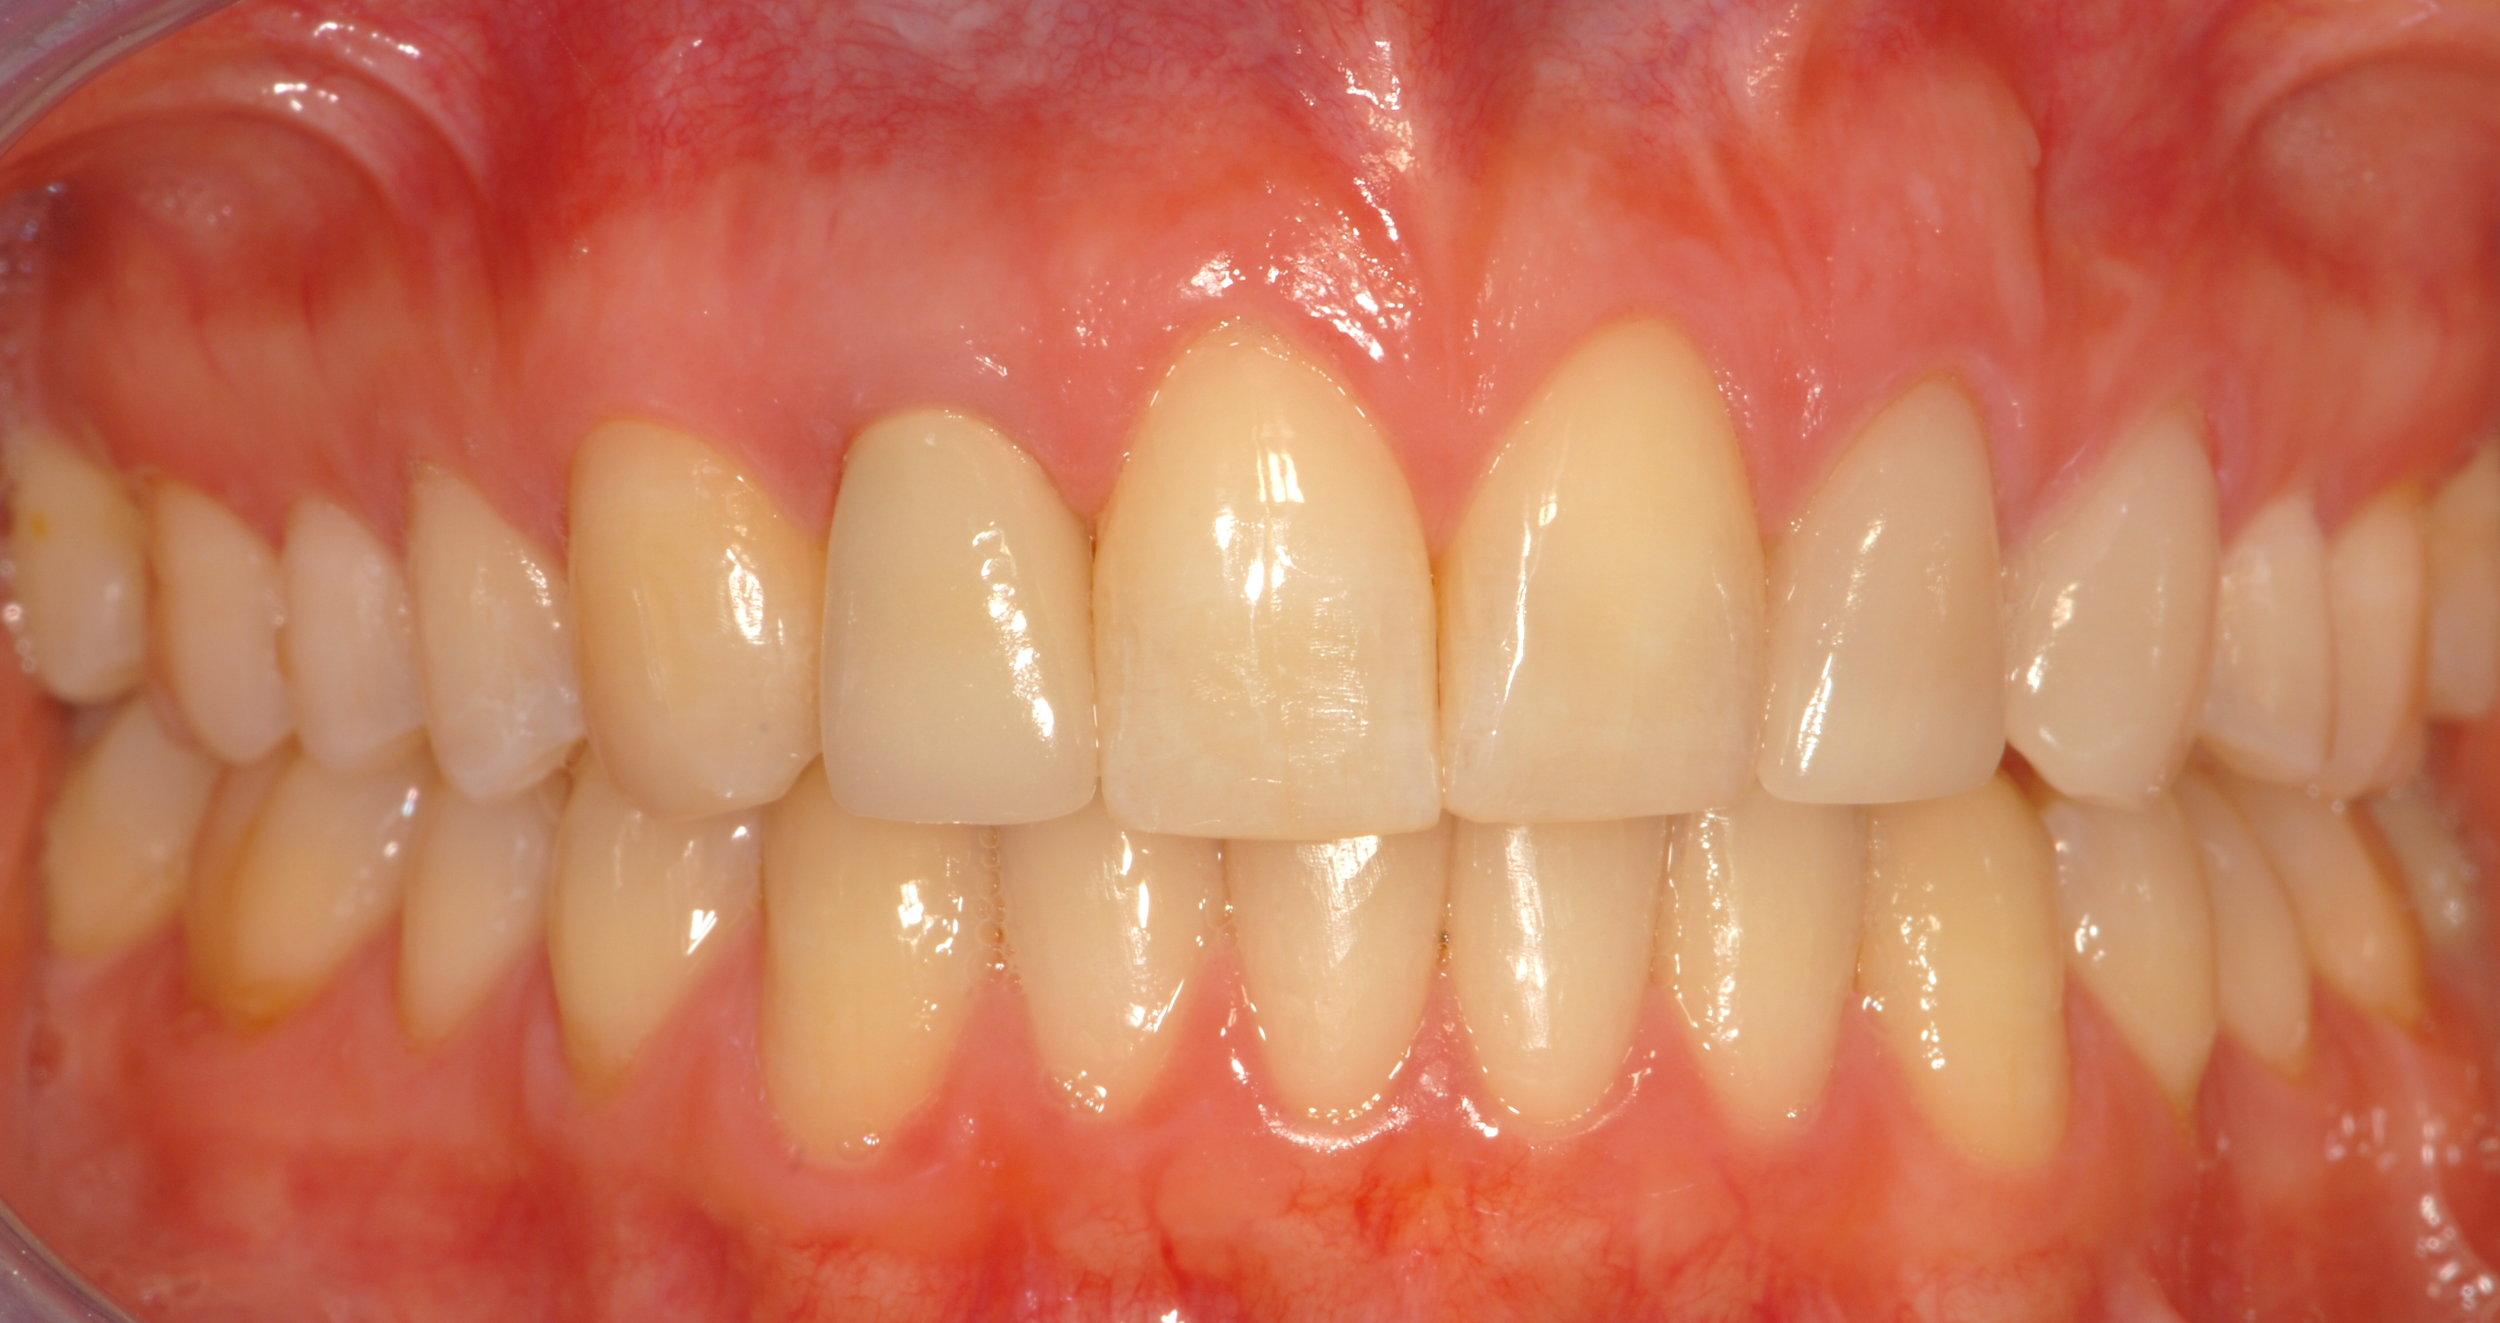 Team dentistry orthodontics, surgery, implants, prosthodontics